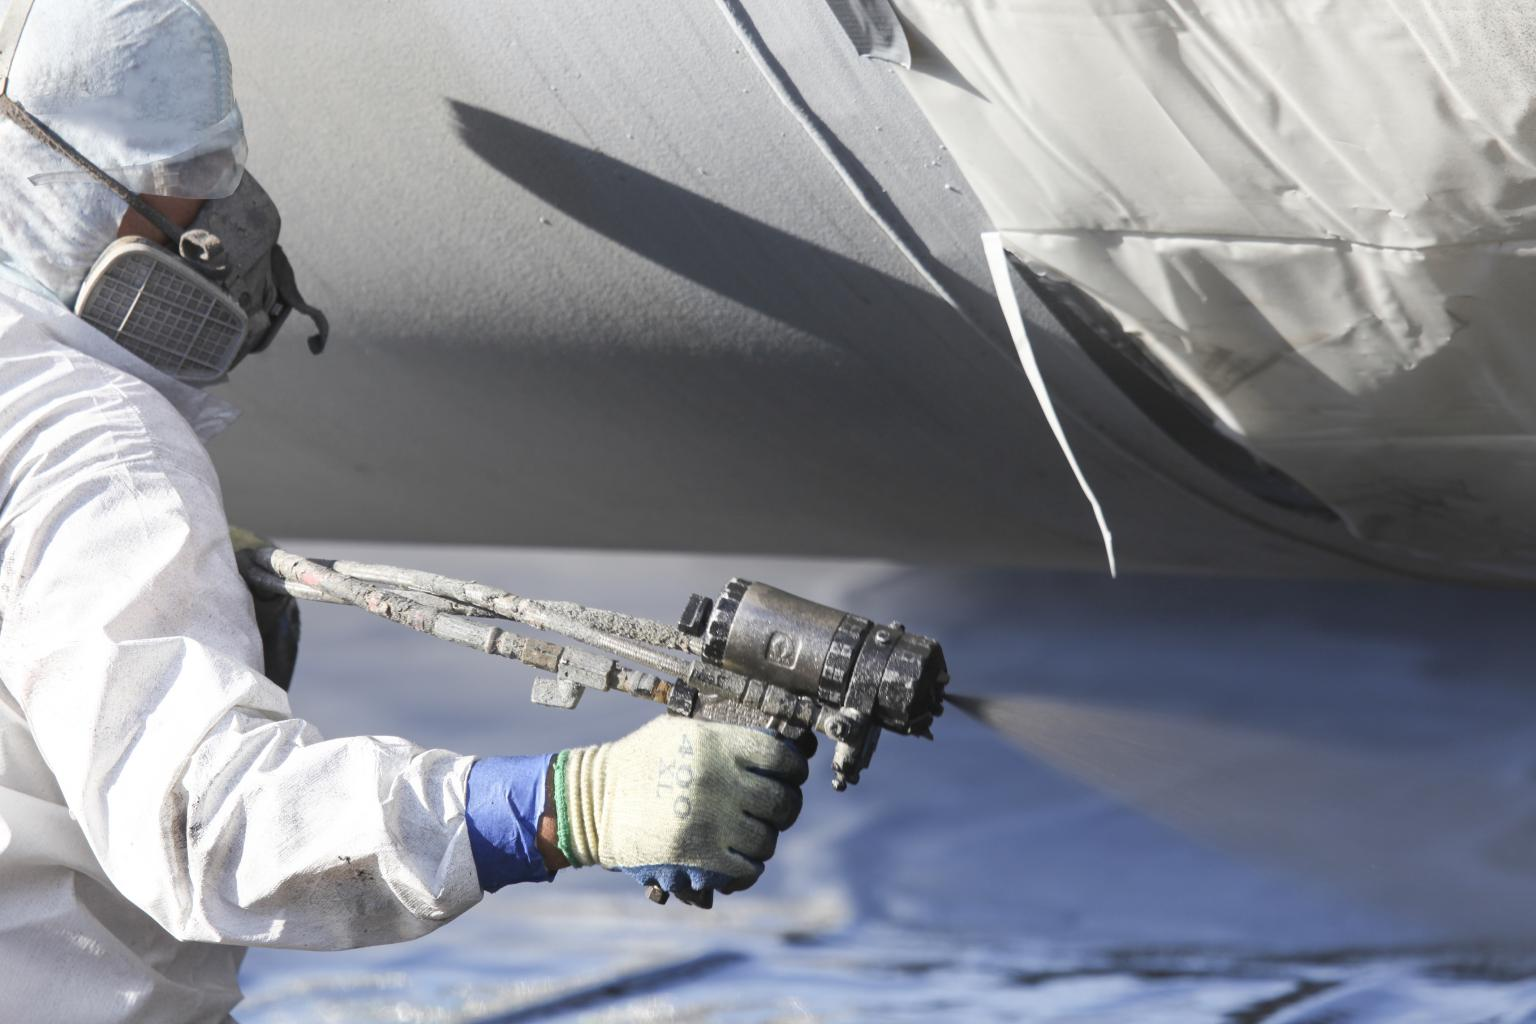 The VersaFlex solution is spray-applied